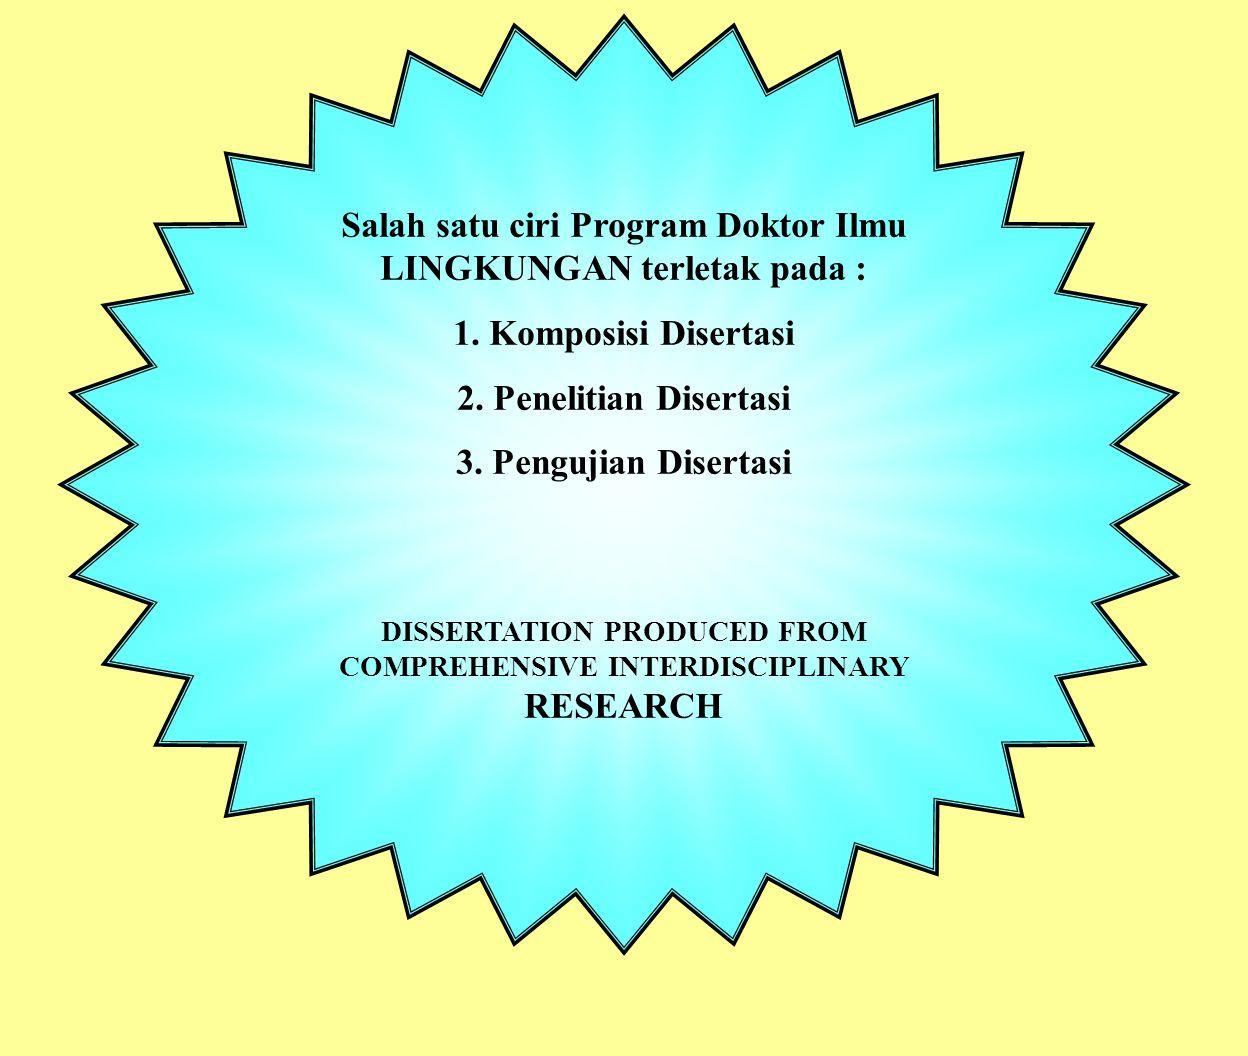 Salah satu ciri Program Doktor Ilmu LINGKUNGAN terletak pada : 1. Komposisi Disertasi 2. Penelitian Disertasi 3. Pengujian Disertasi DISSERTATION PROD